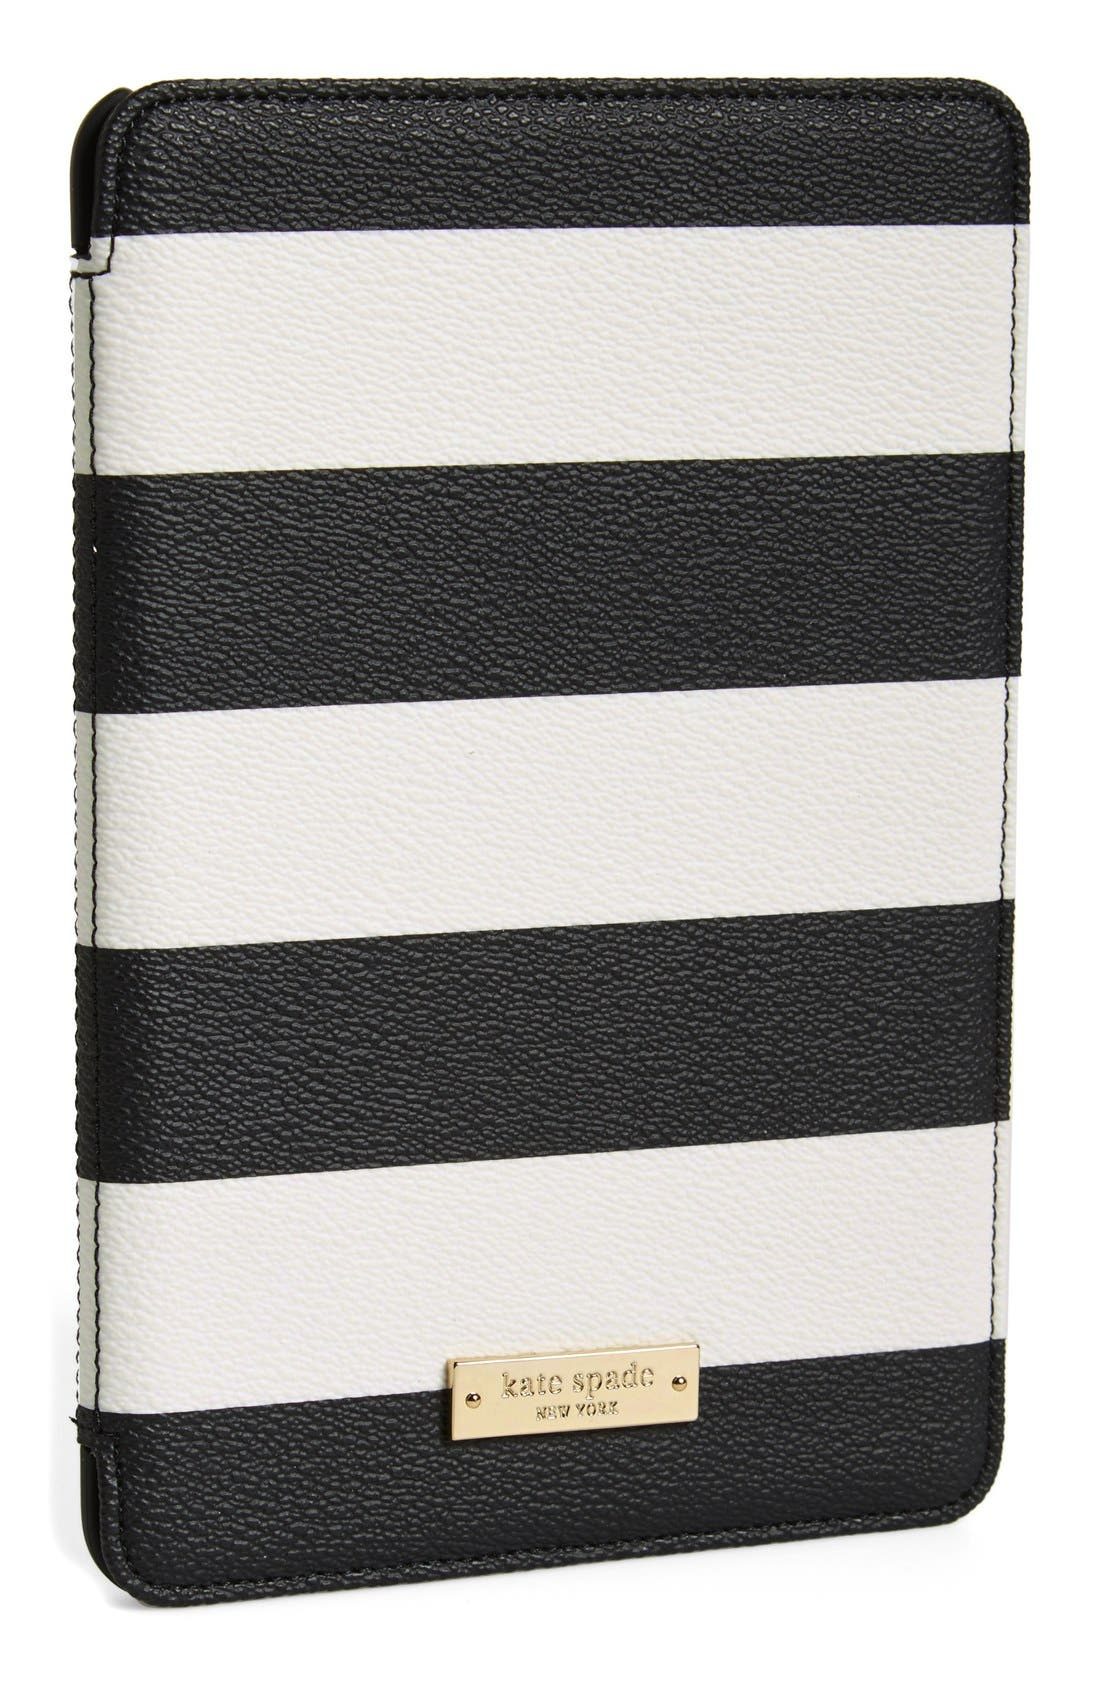 Main Image - kate spade new york 'hawthorne lane' iPad mini case